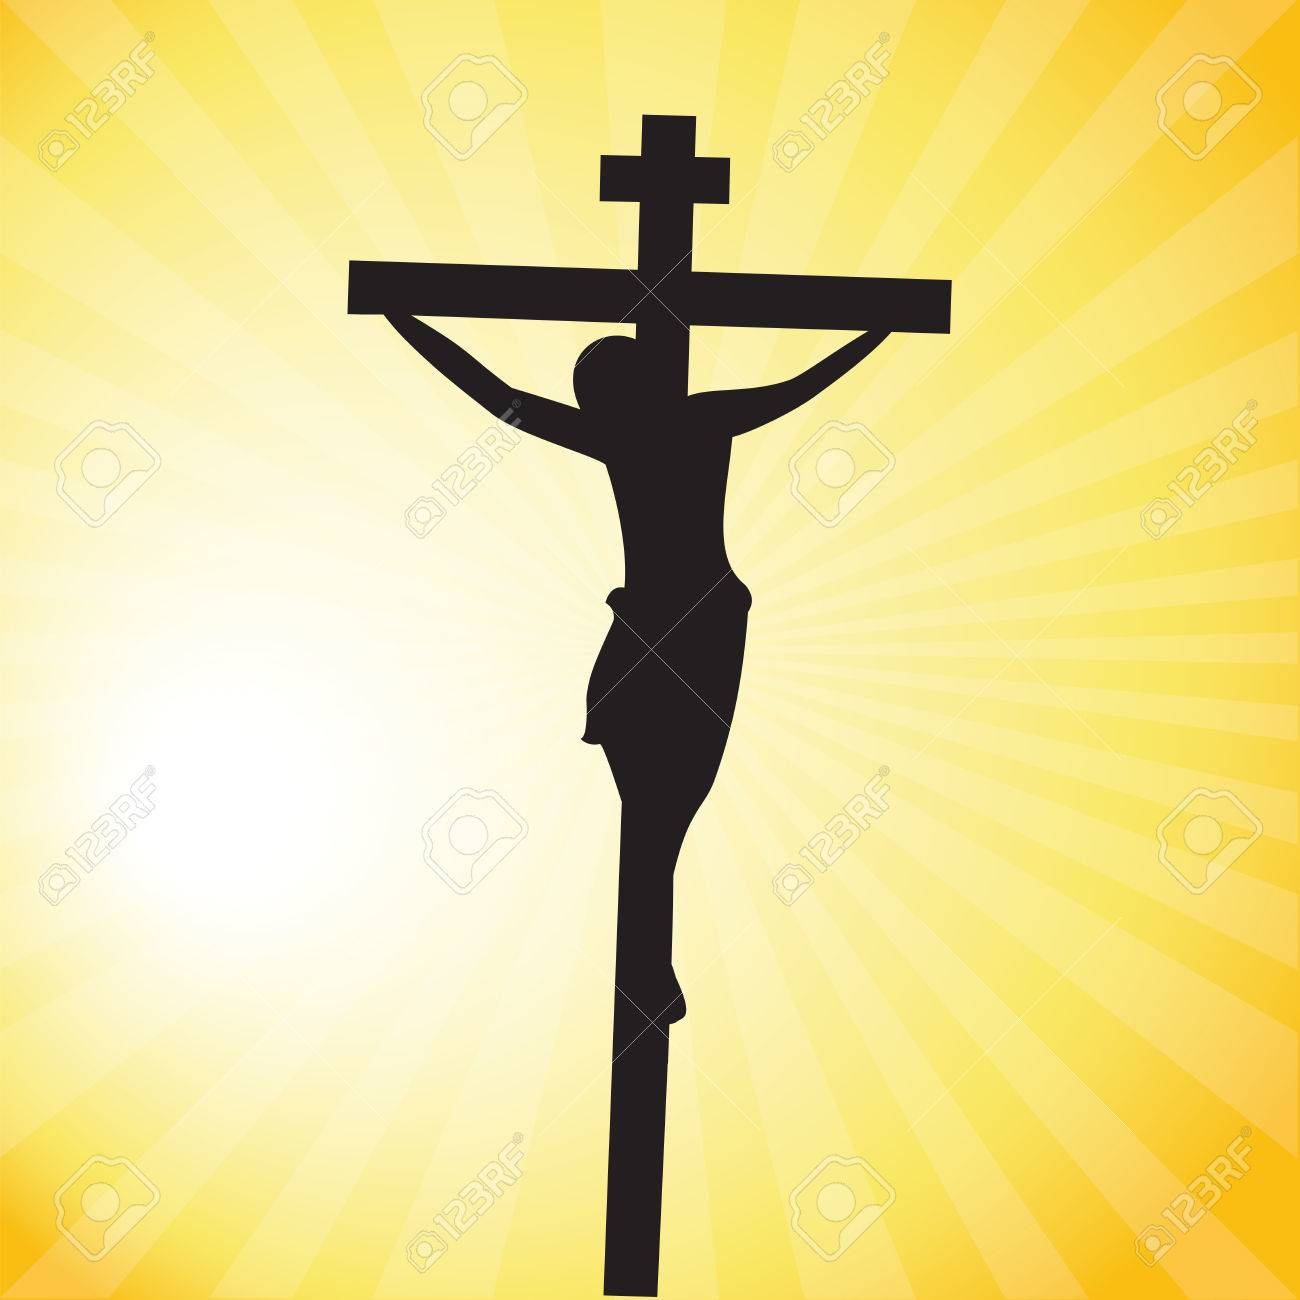 Jesus Christ crucifixion silhouette.